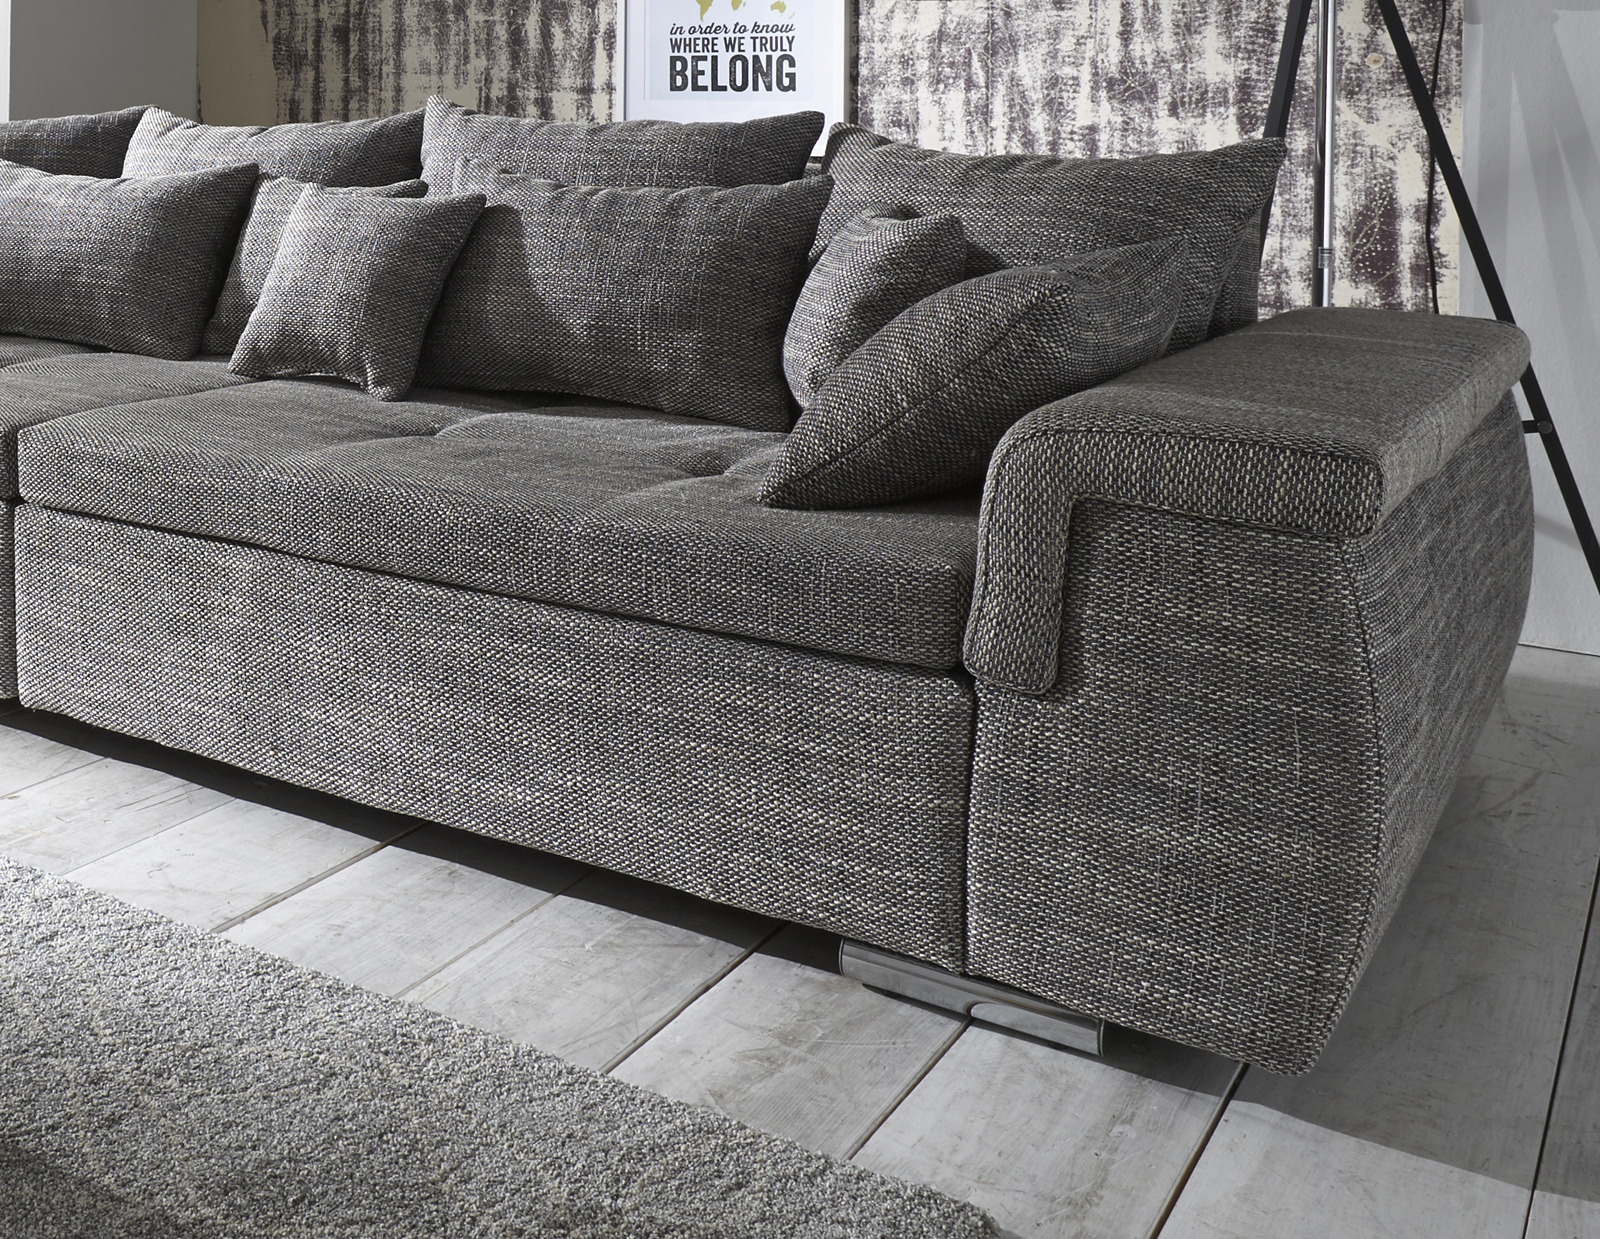 sam design big sofa grau 278 x 117 cm whopper bestellware. Black Bedroom Furniture Sets. Home Design Ideas